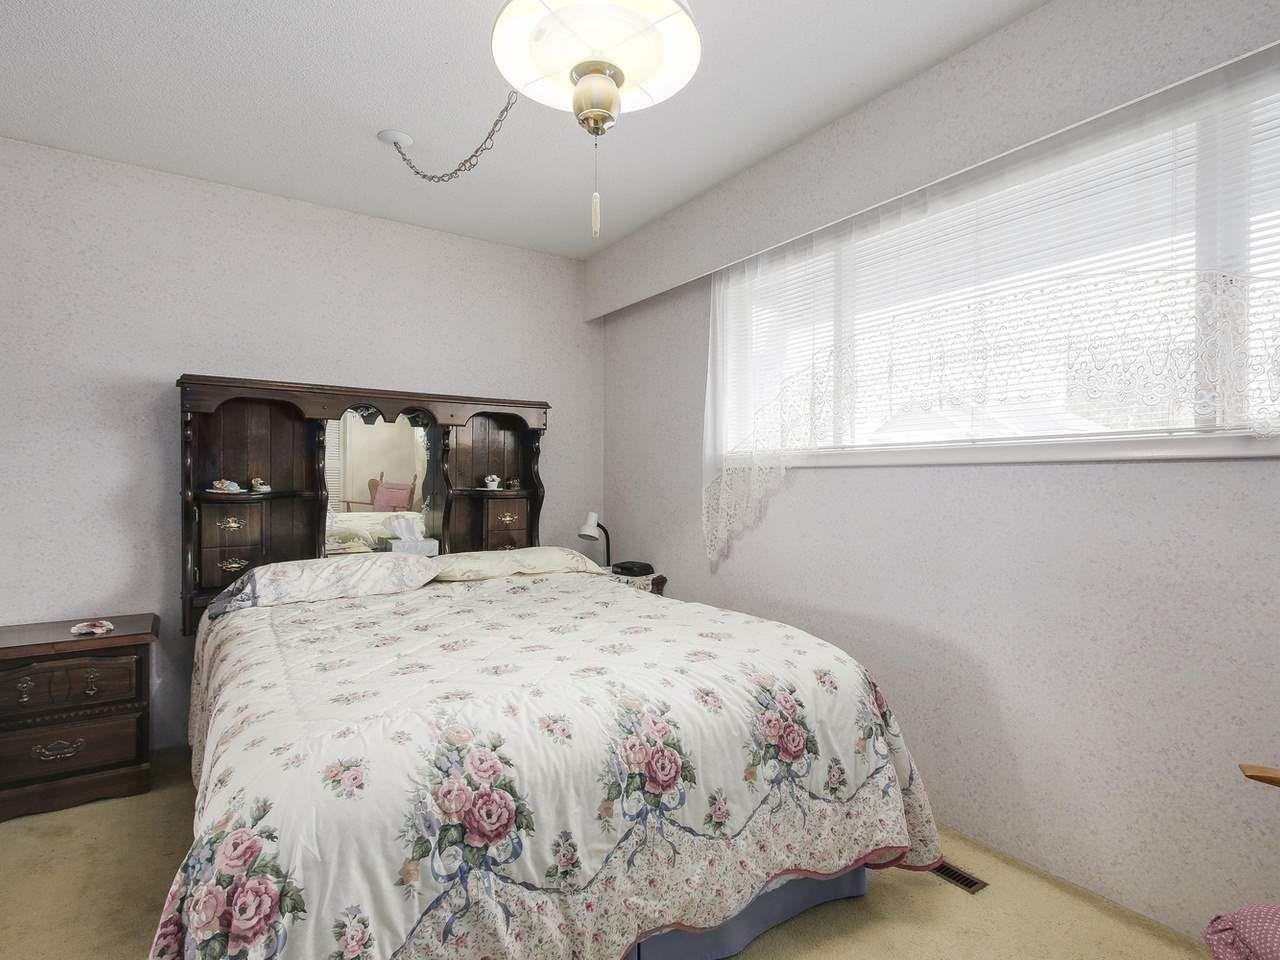 Photo 10: Photos: 1320 REGAN Avenue in Coquitlam: Central Coquitlam House for sale : MLS®# R2147096